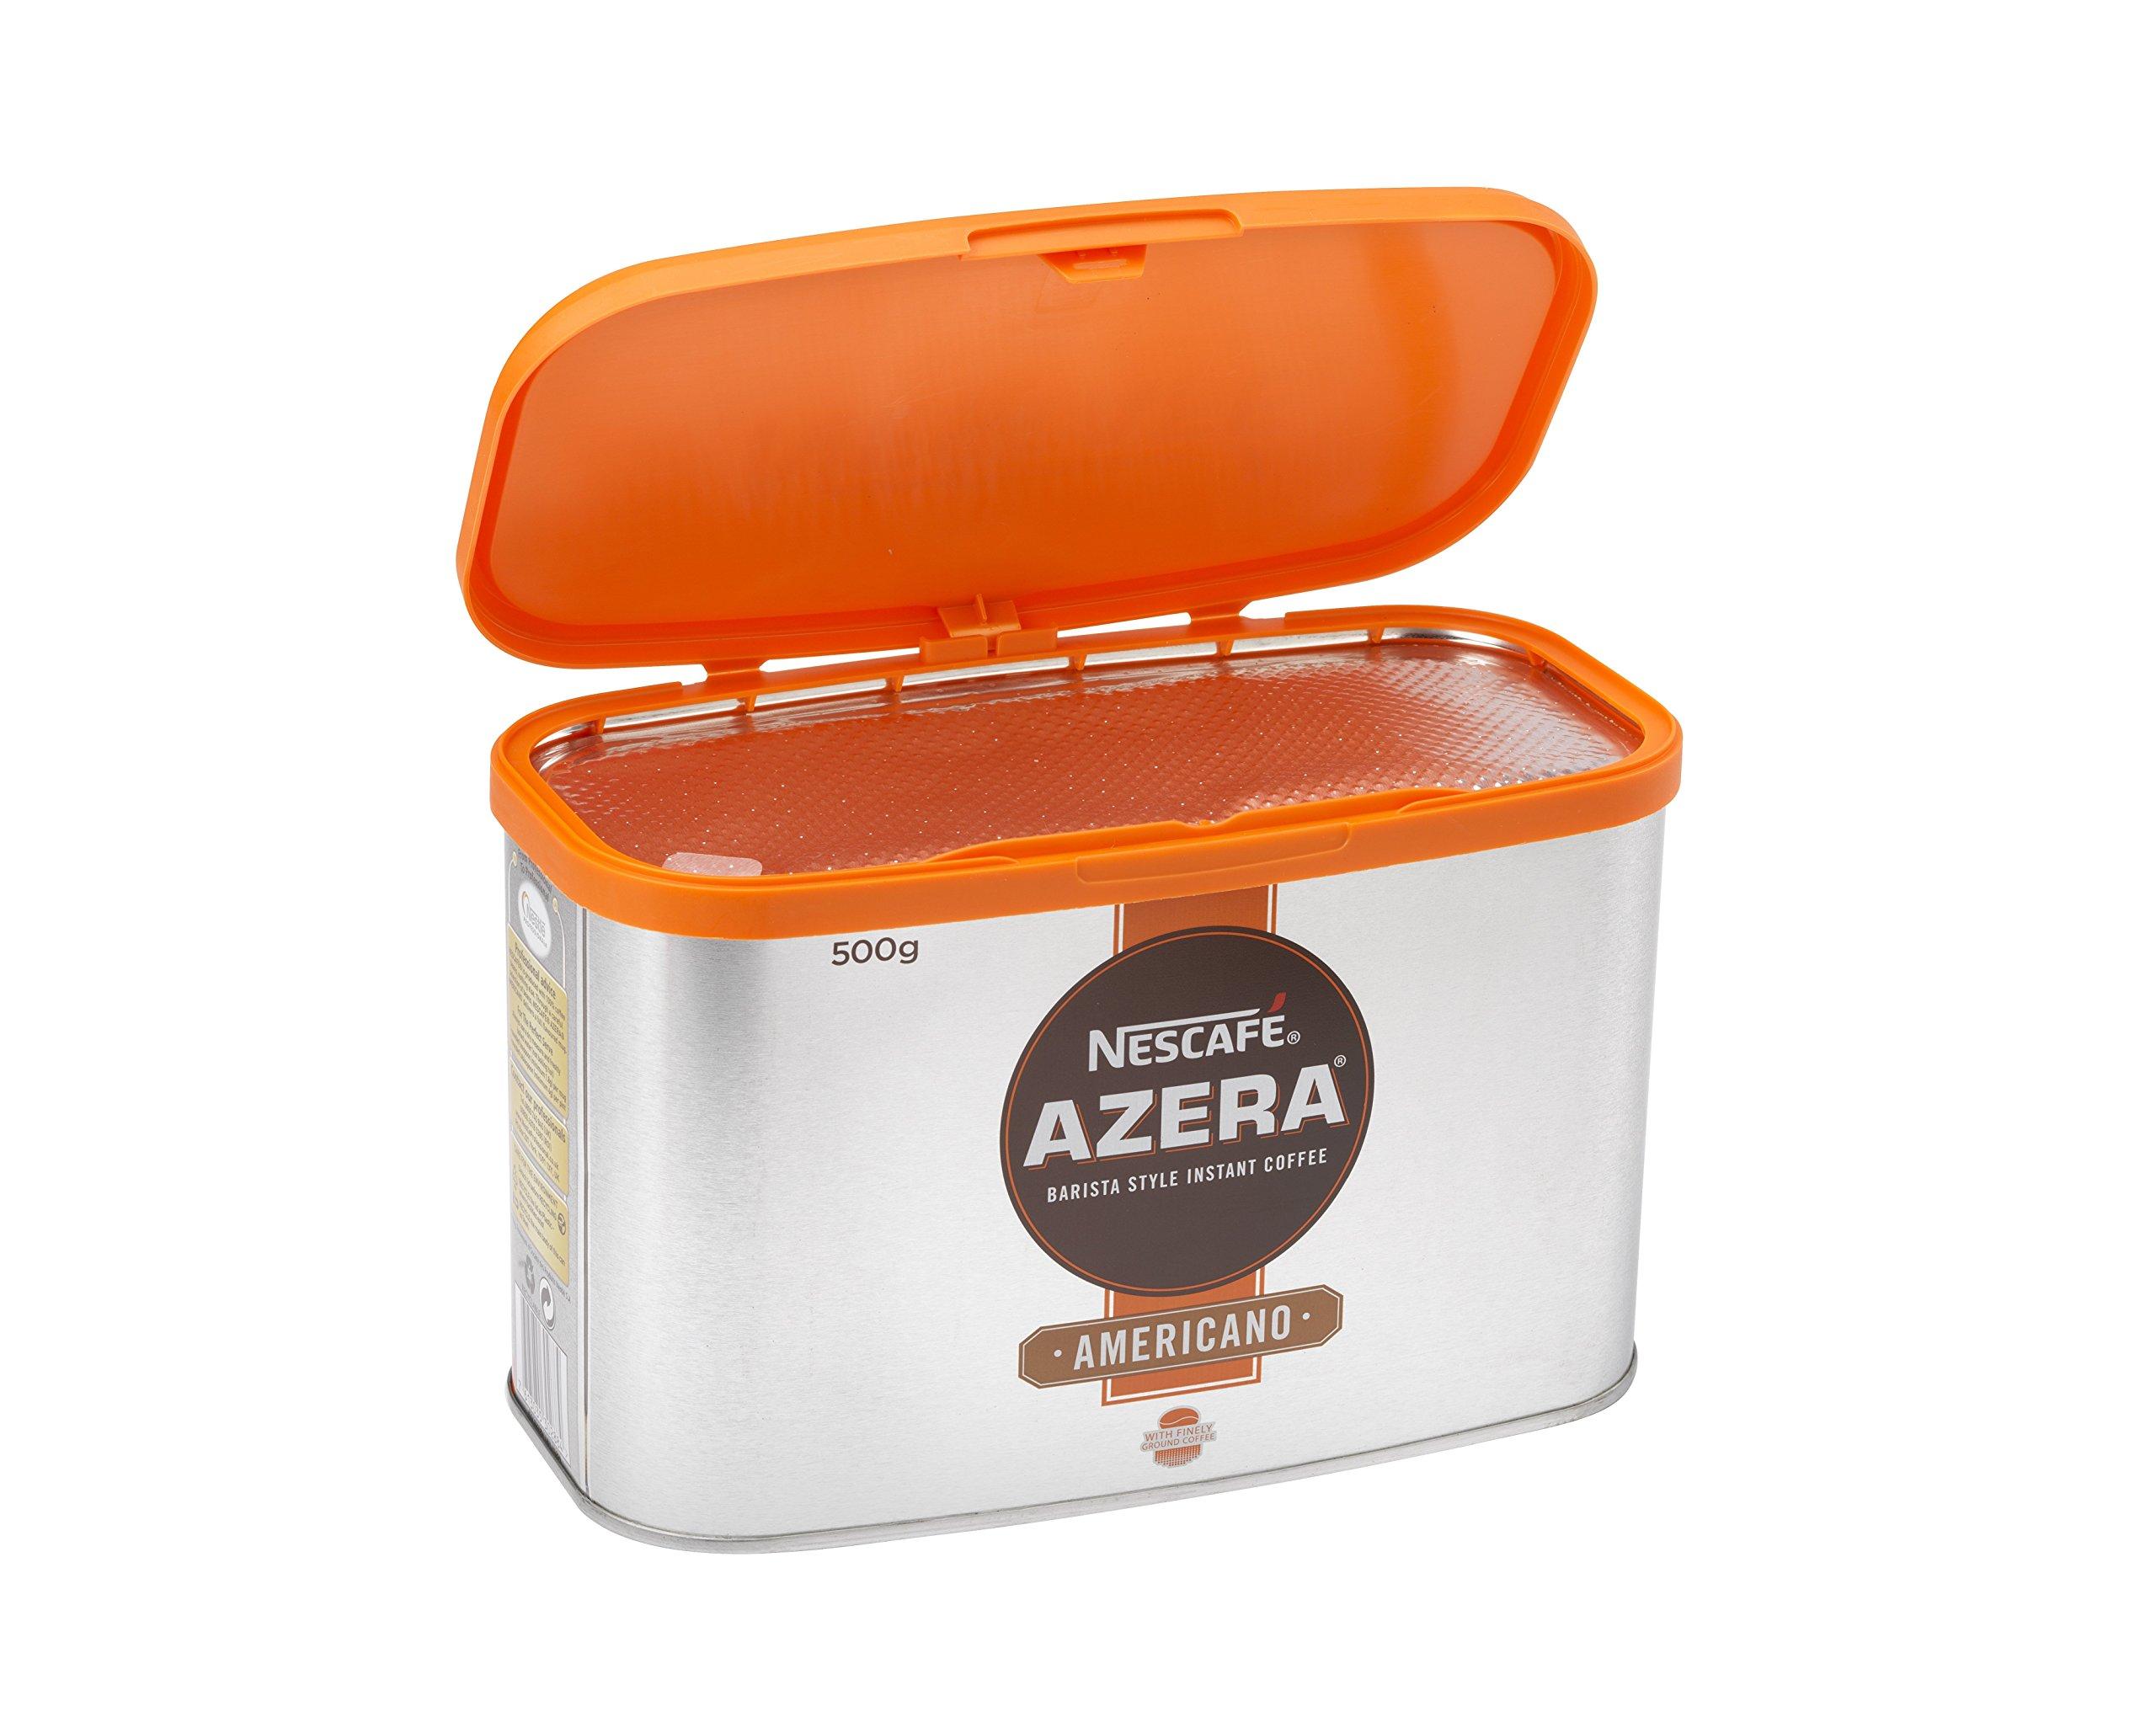 Nescafé Azera Americano Instant Coffee with Ground Beans 500g